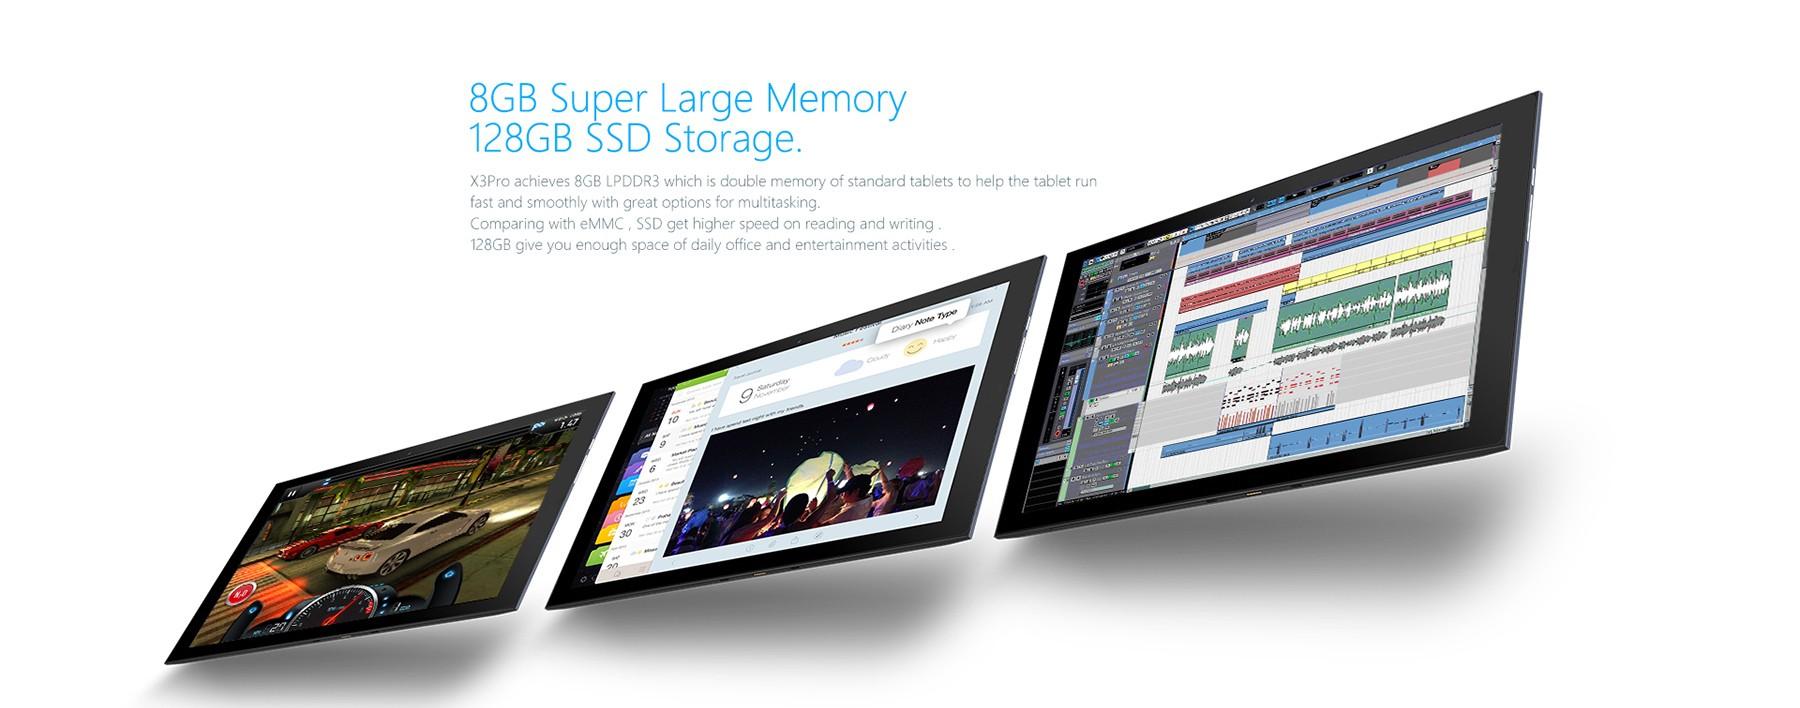 Teclast X3 Pro 2 in 1 Ultrabook Tablet PCレビュー メモリRAMとROMのスペック参考画像